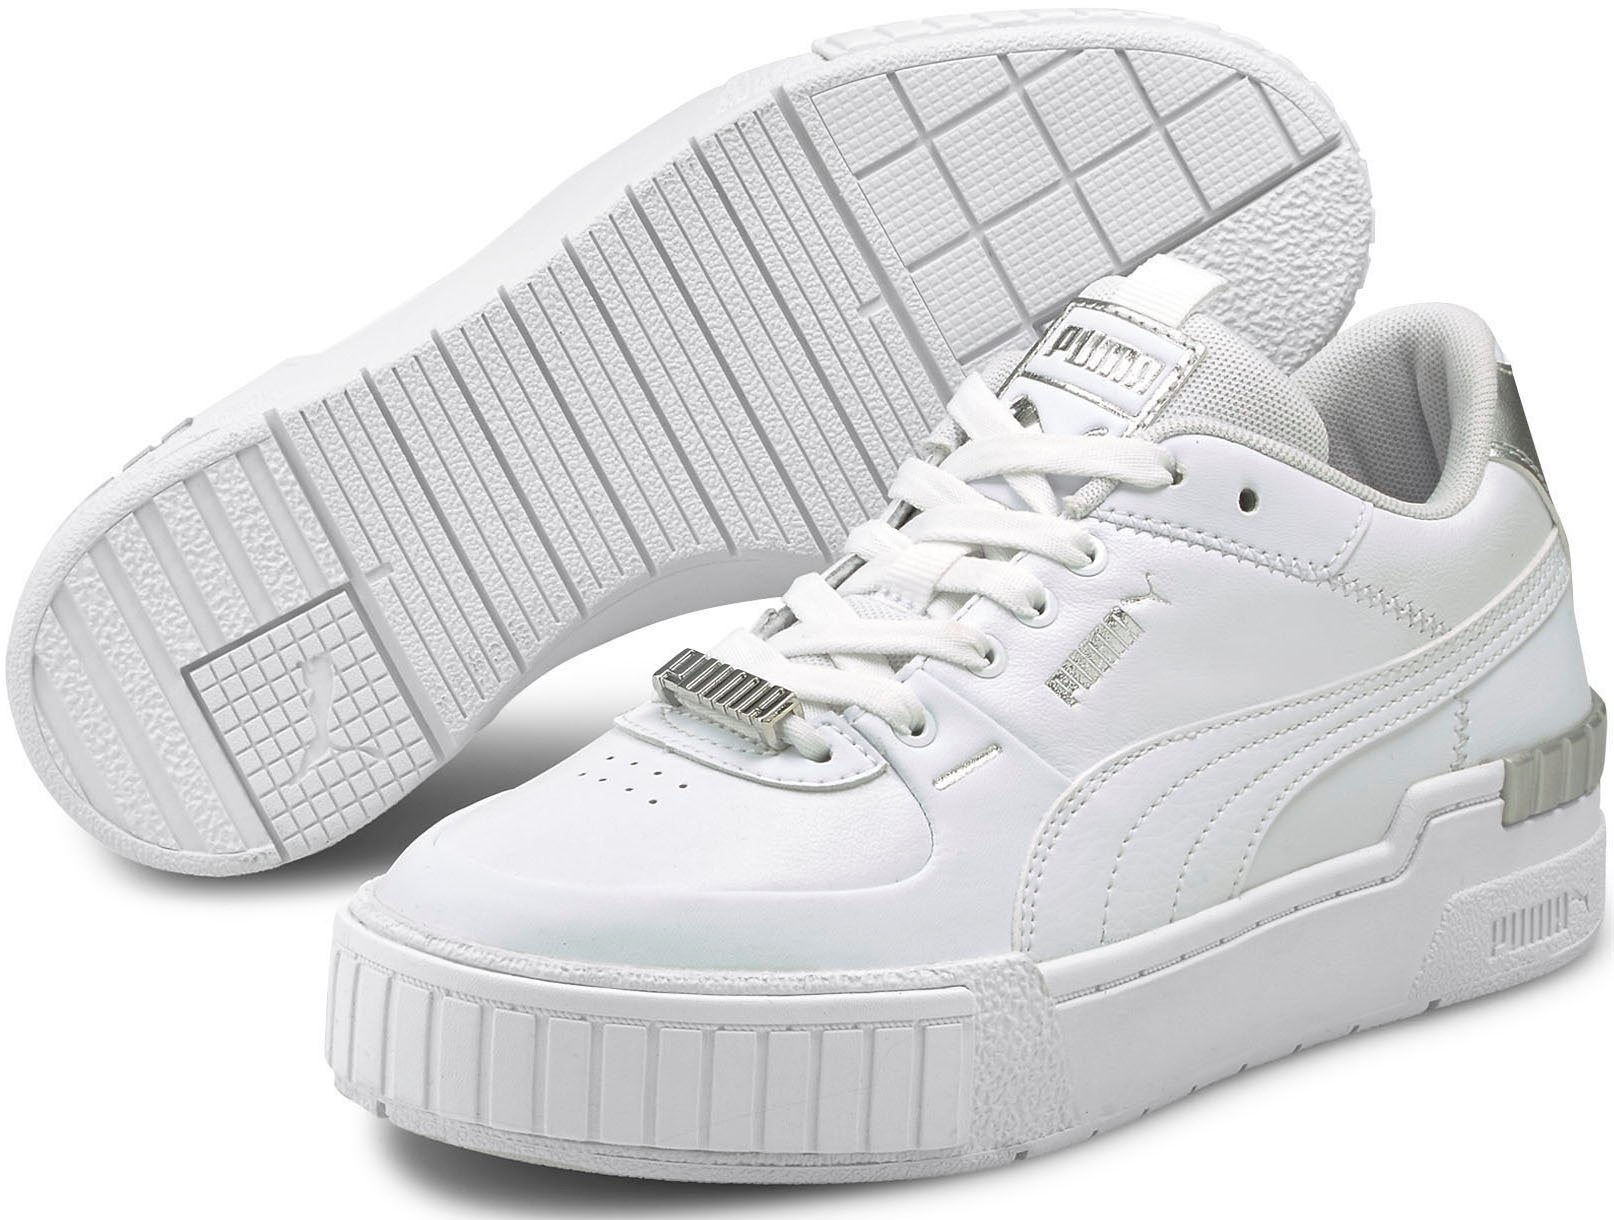 PUMA sneakers Cali Sport Metallic Wn's - gratis ruilen op otto.nl